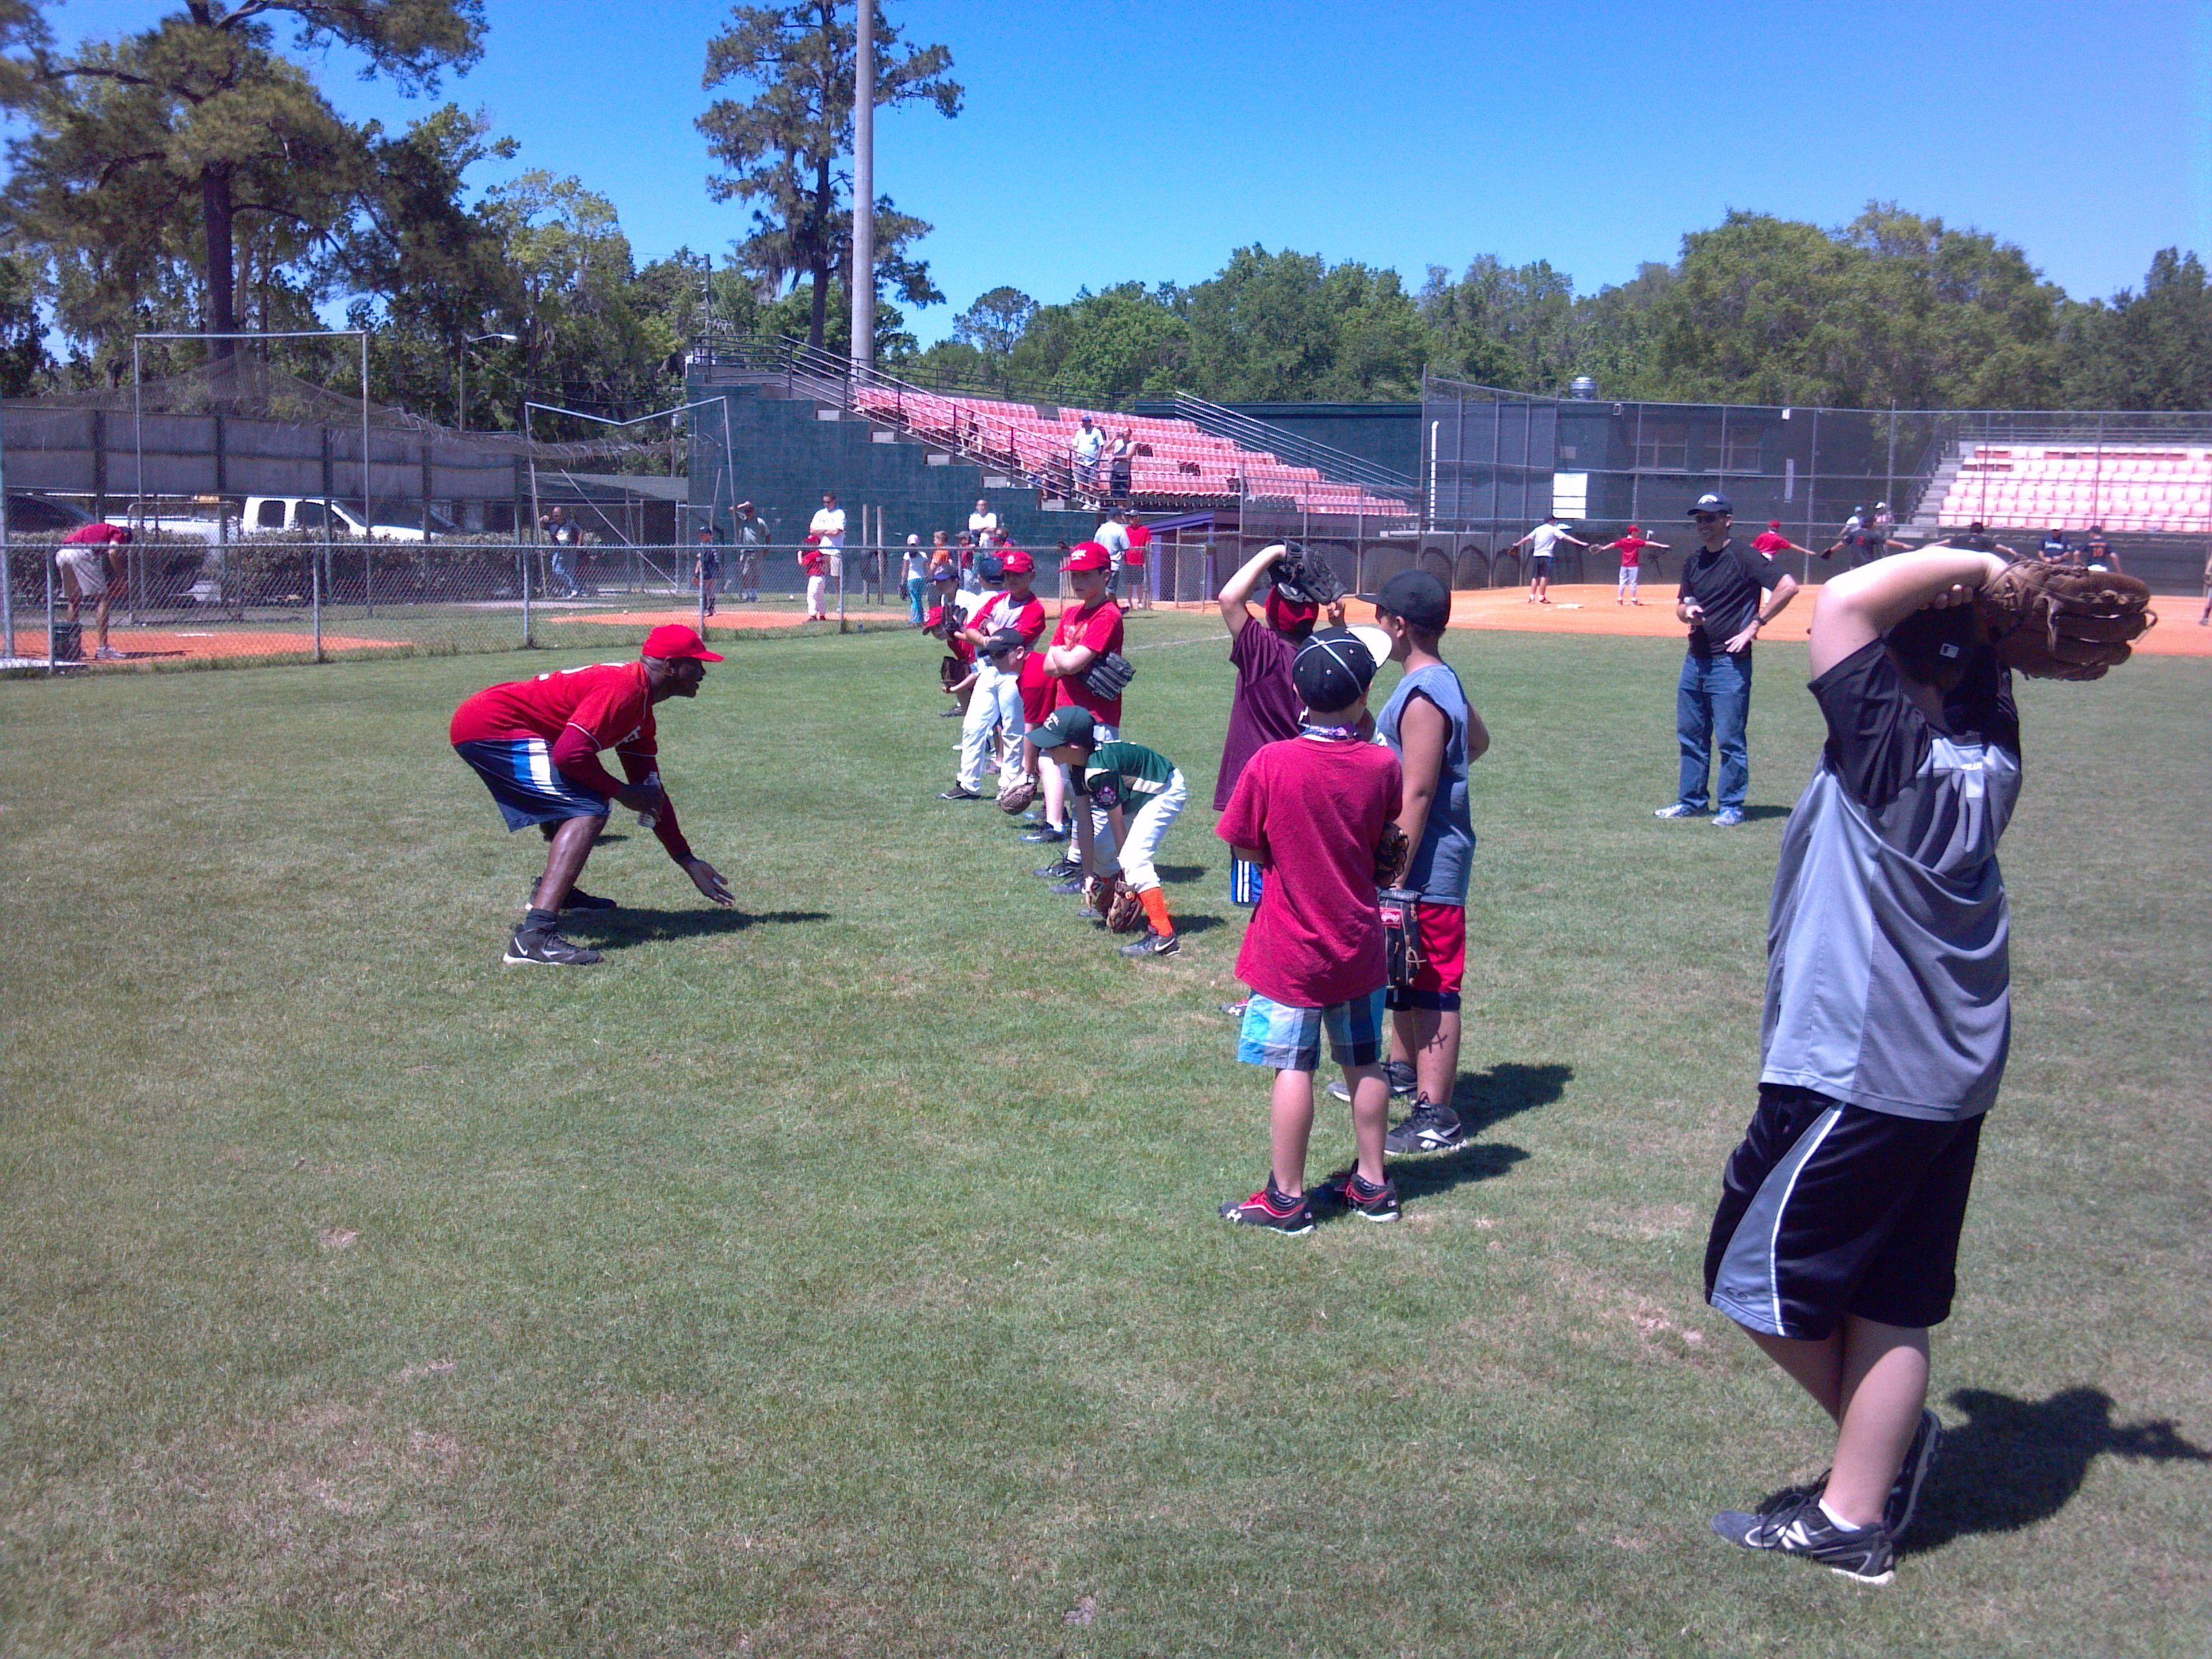 Hard Hittin Mark Whiten Shows Proper Fielding Technique At A Legends For Youth Clinic In Bro Major League Baseball Players Baseball Players Alumni Association